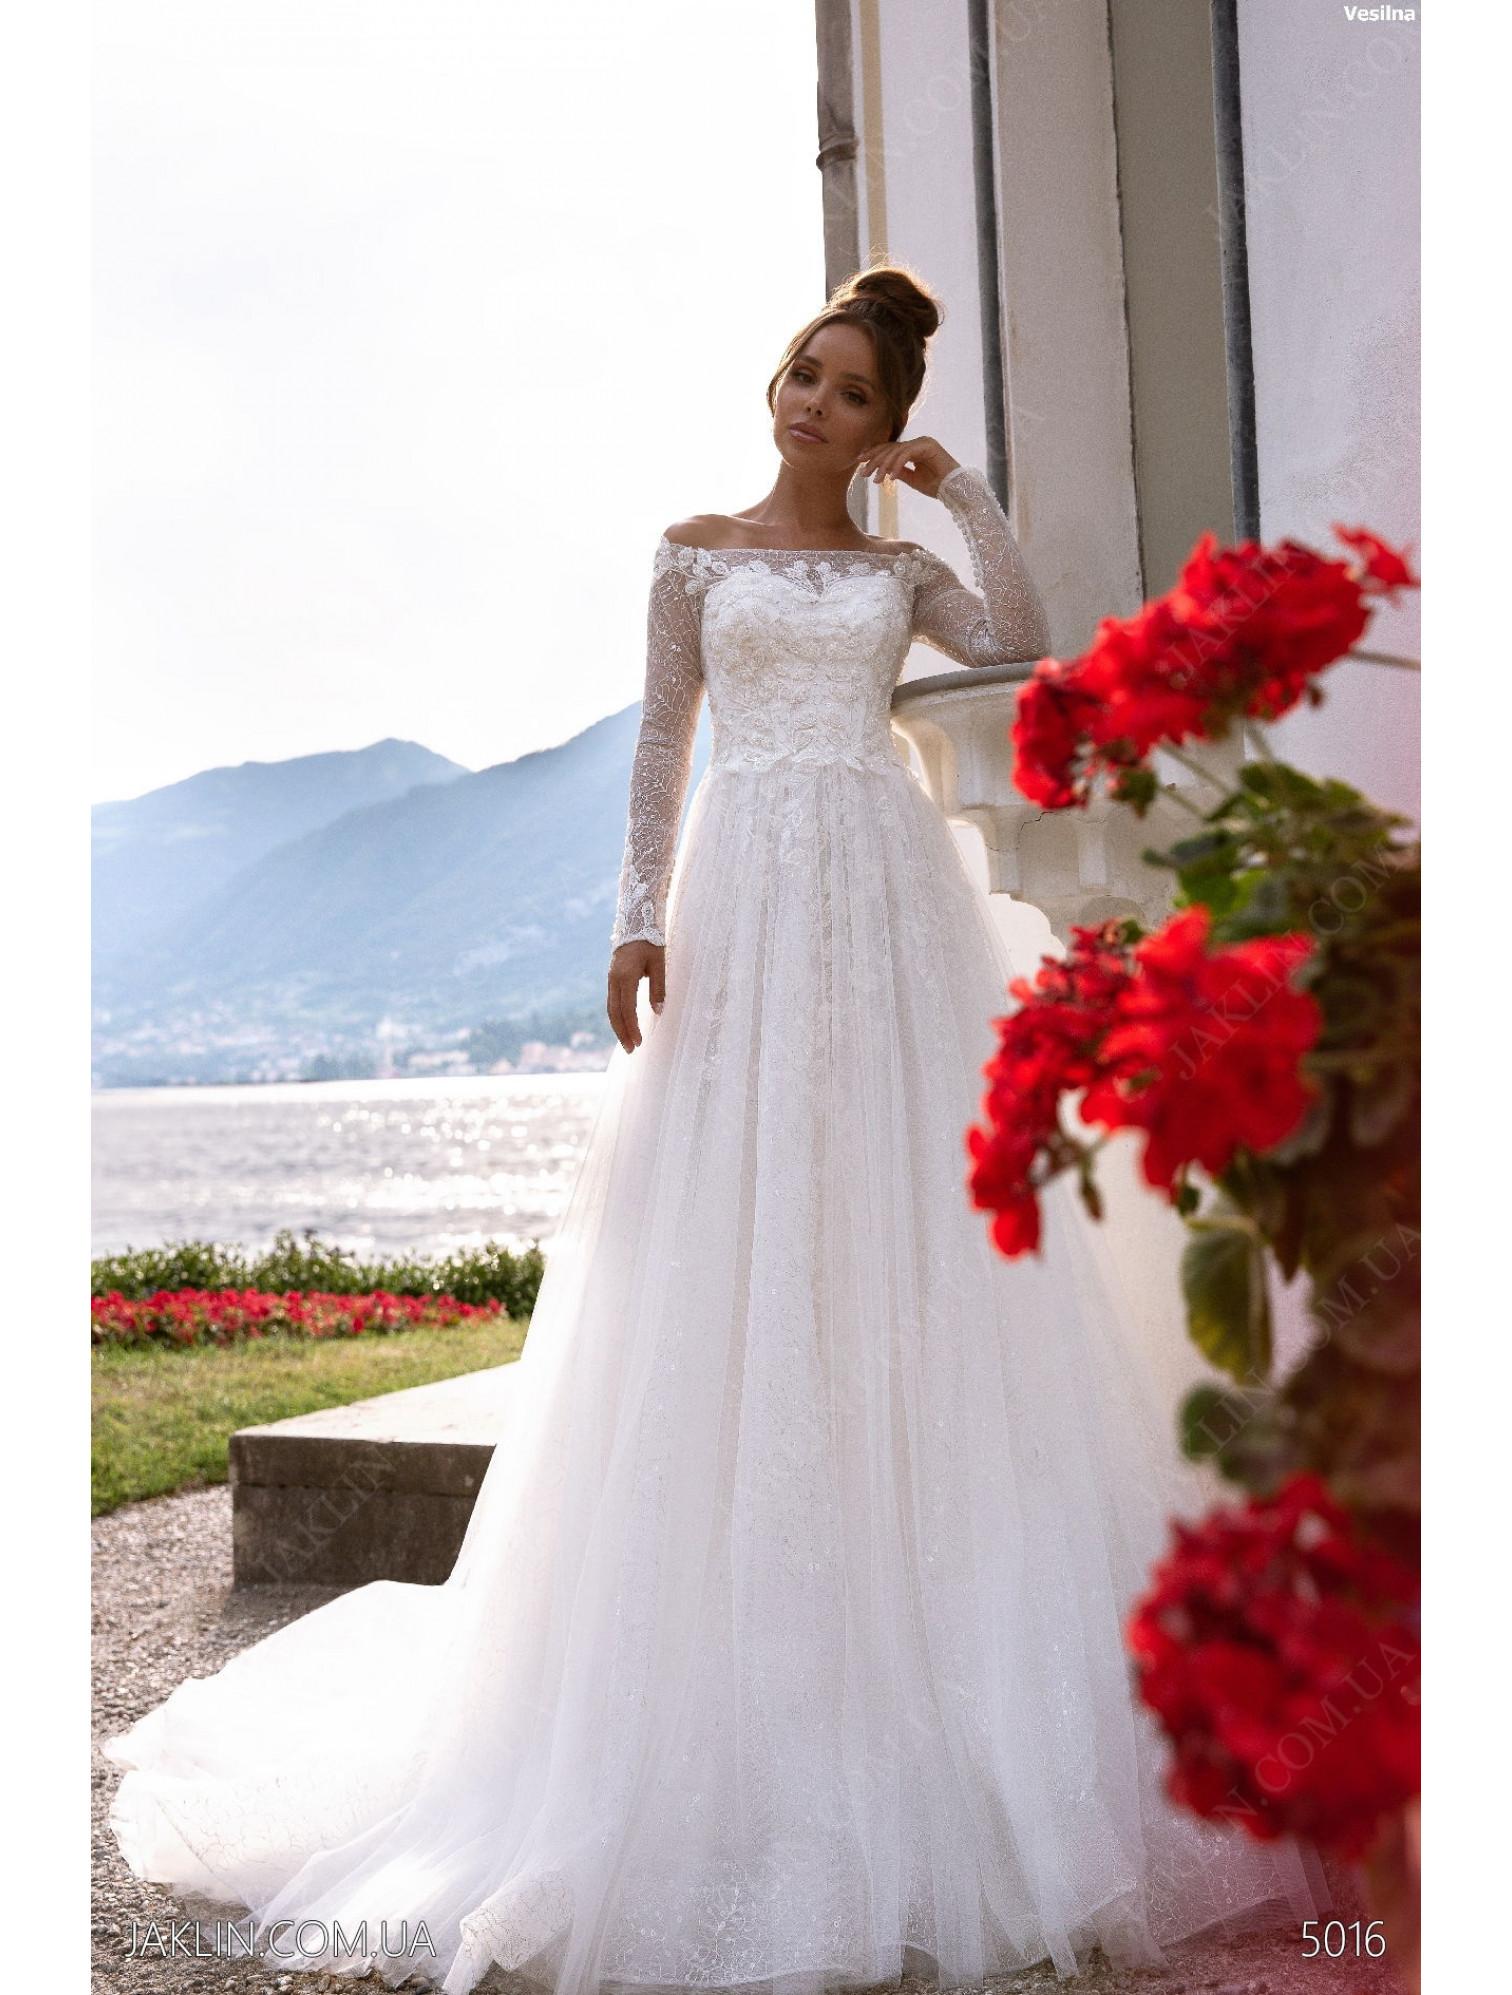 Wedding dress 5016